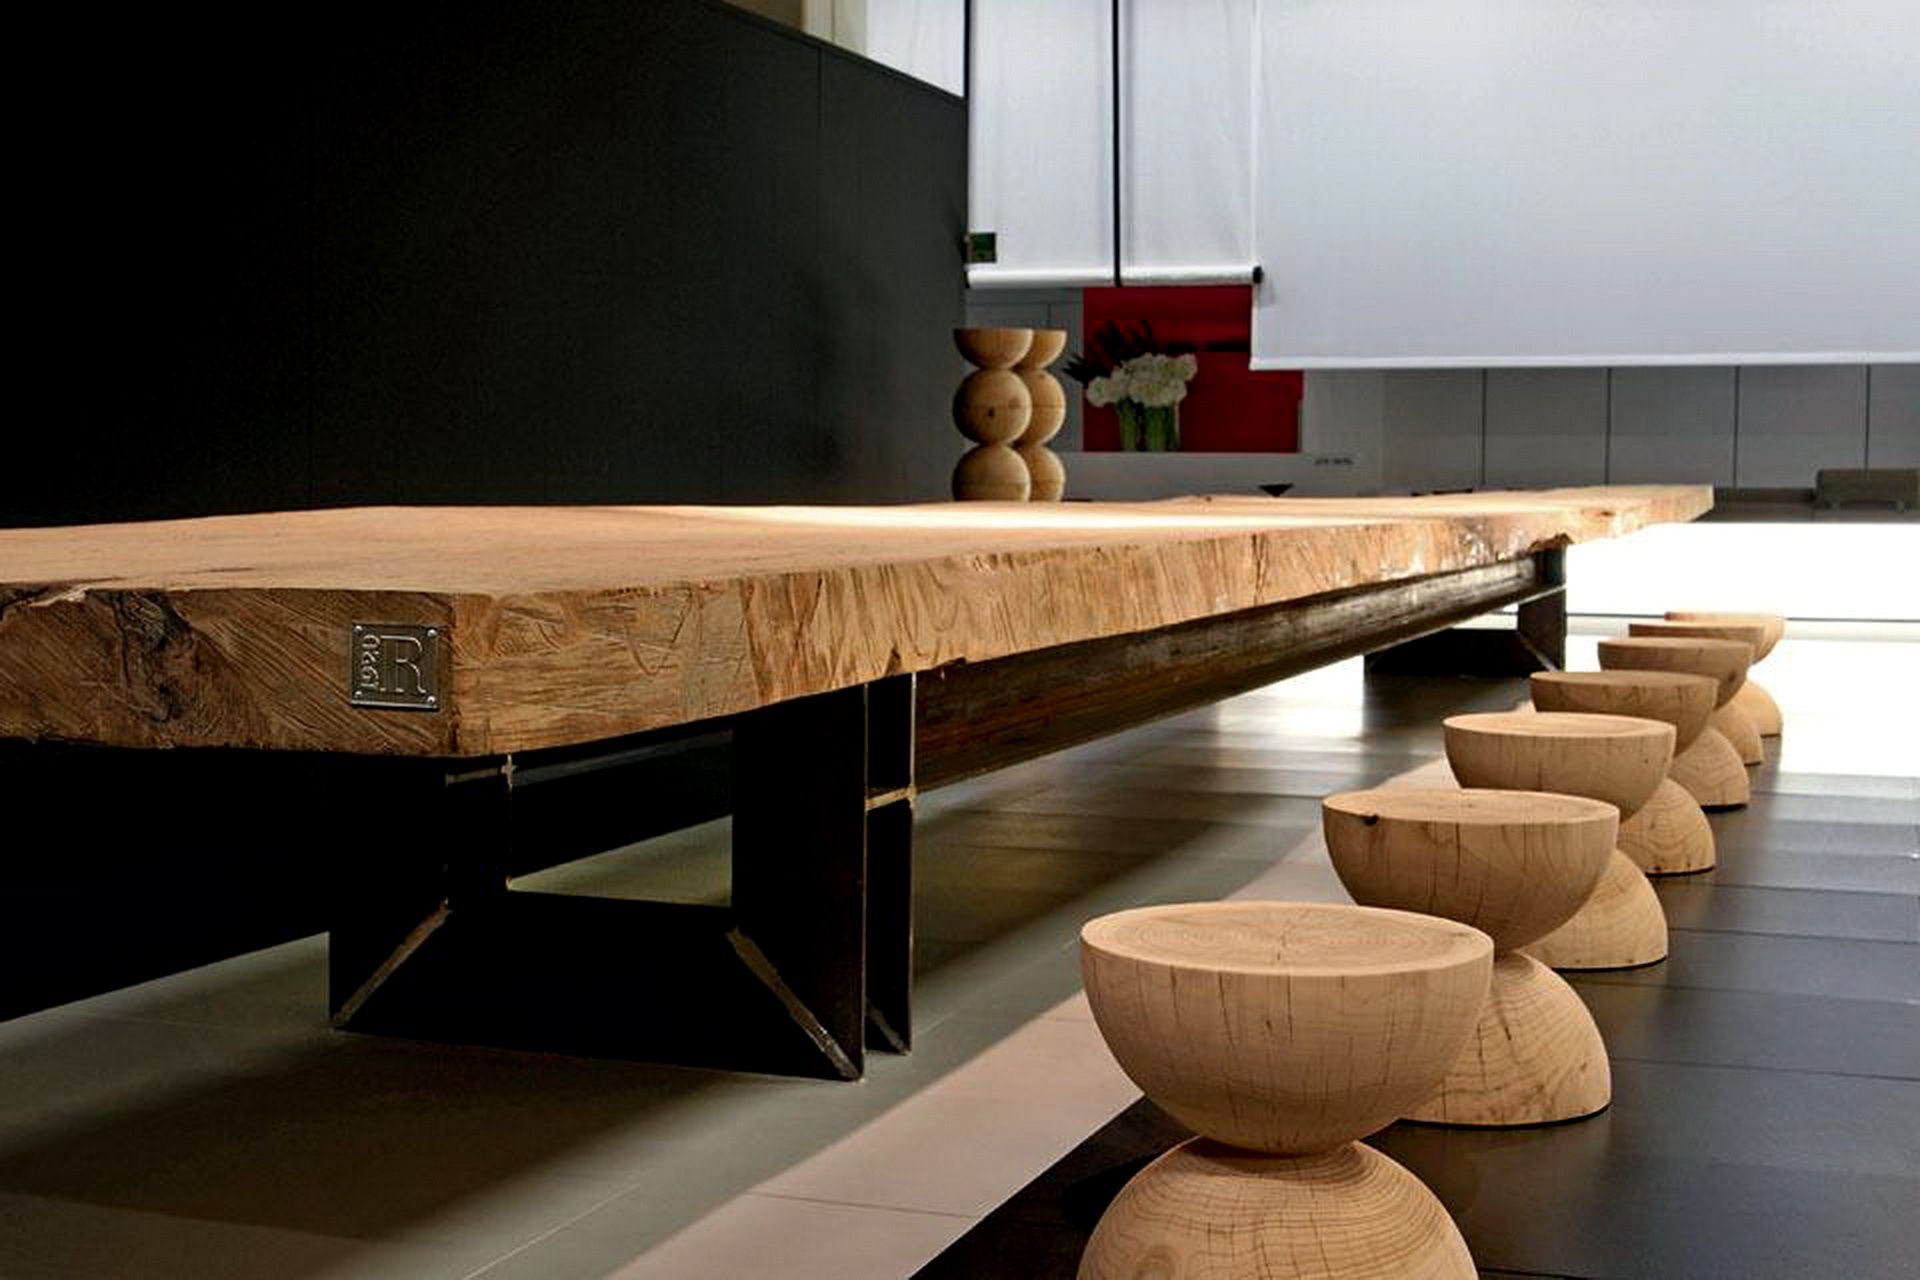 Design Mobel Furniture Nz : Pin by Agustin De La Garza on Mobel+design  Pinterest